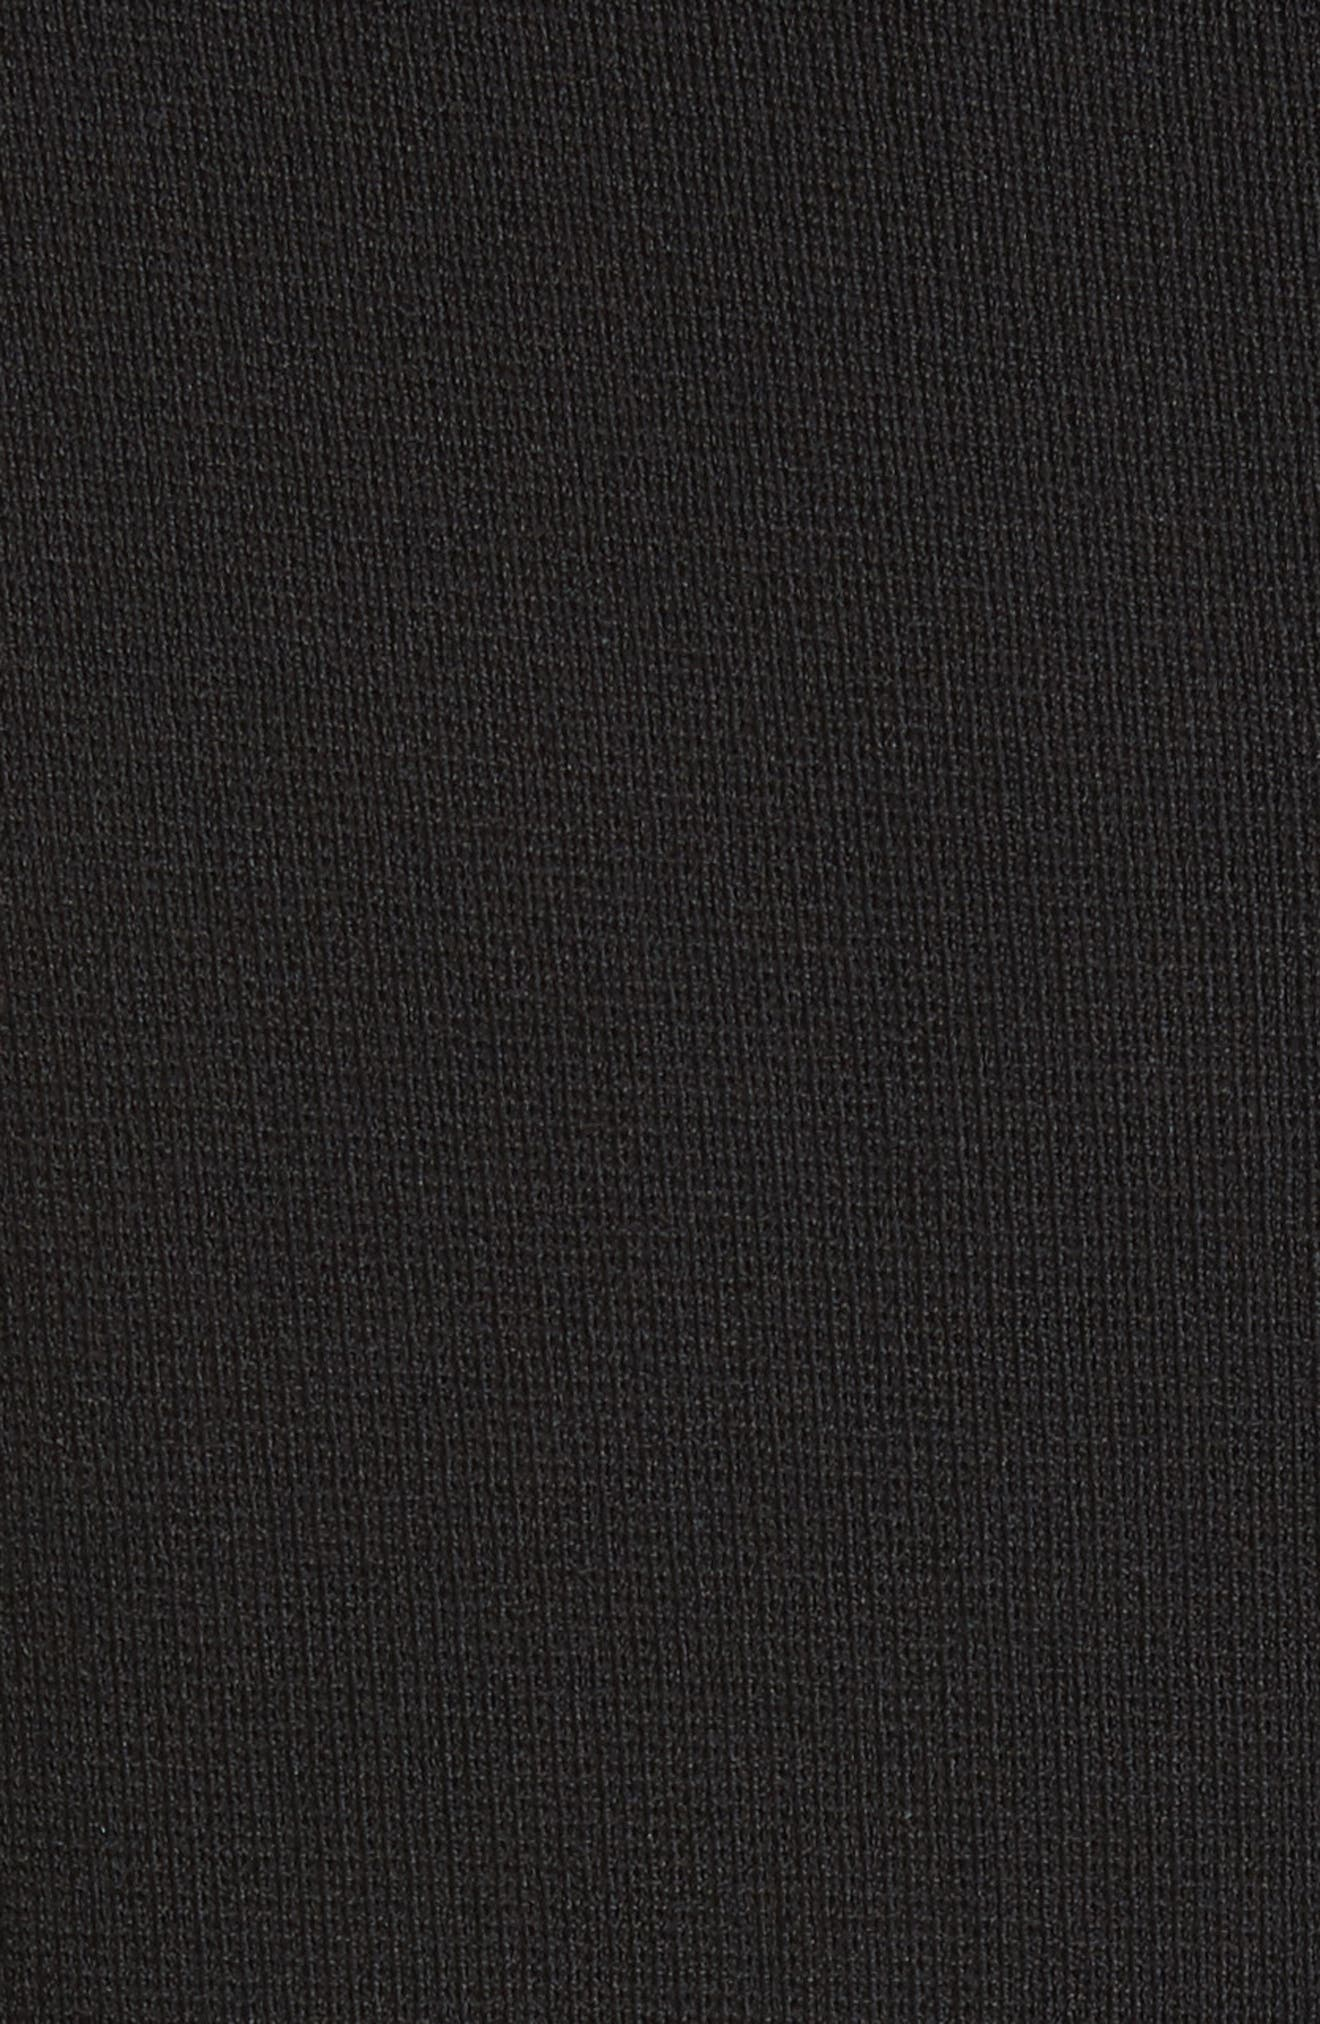 High Neck Fit & Flare Dress,                             Alternate thumbnail 5, color,                             001